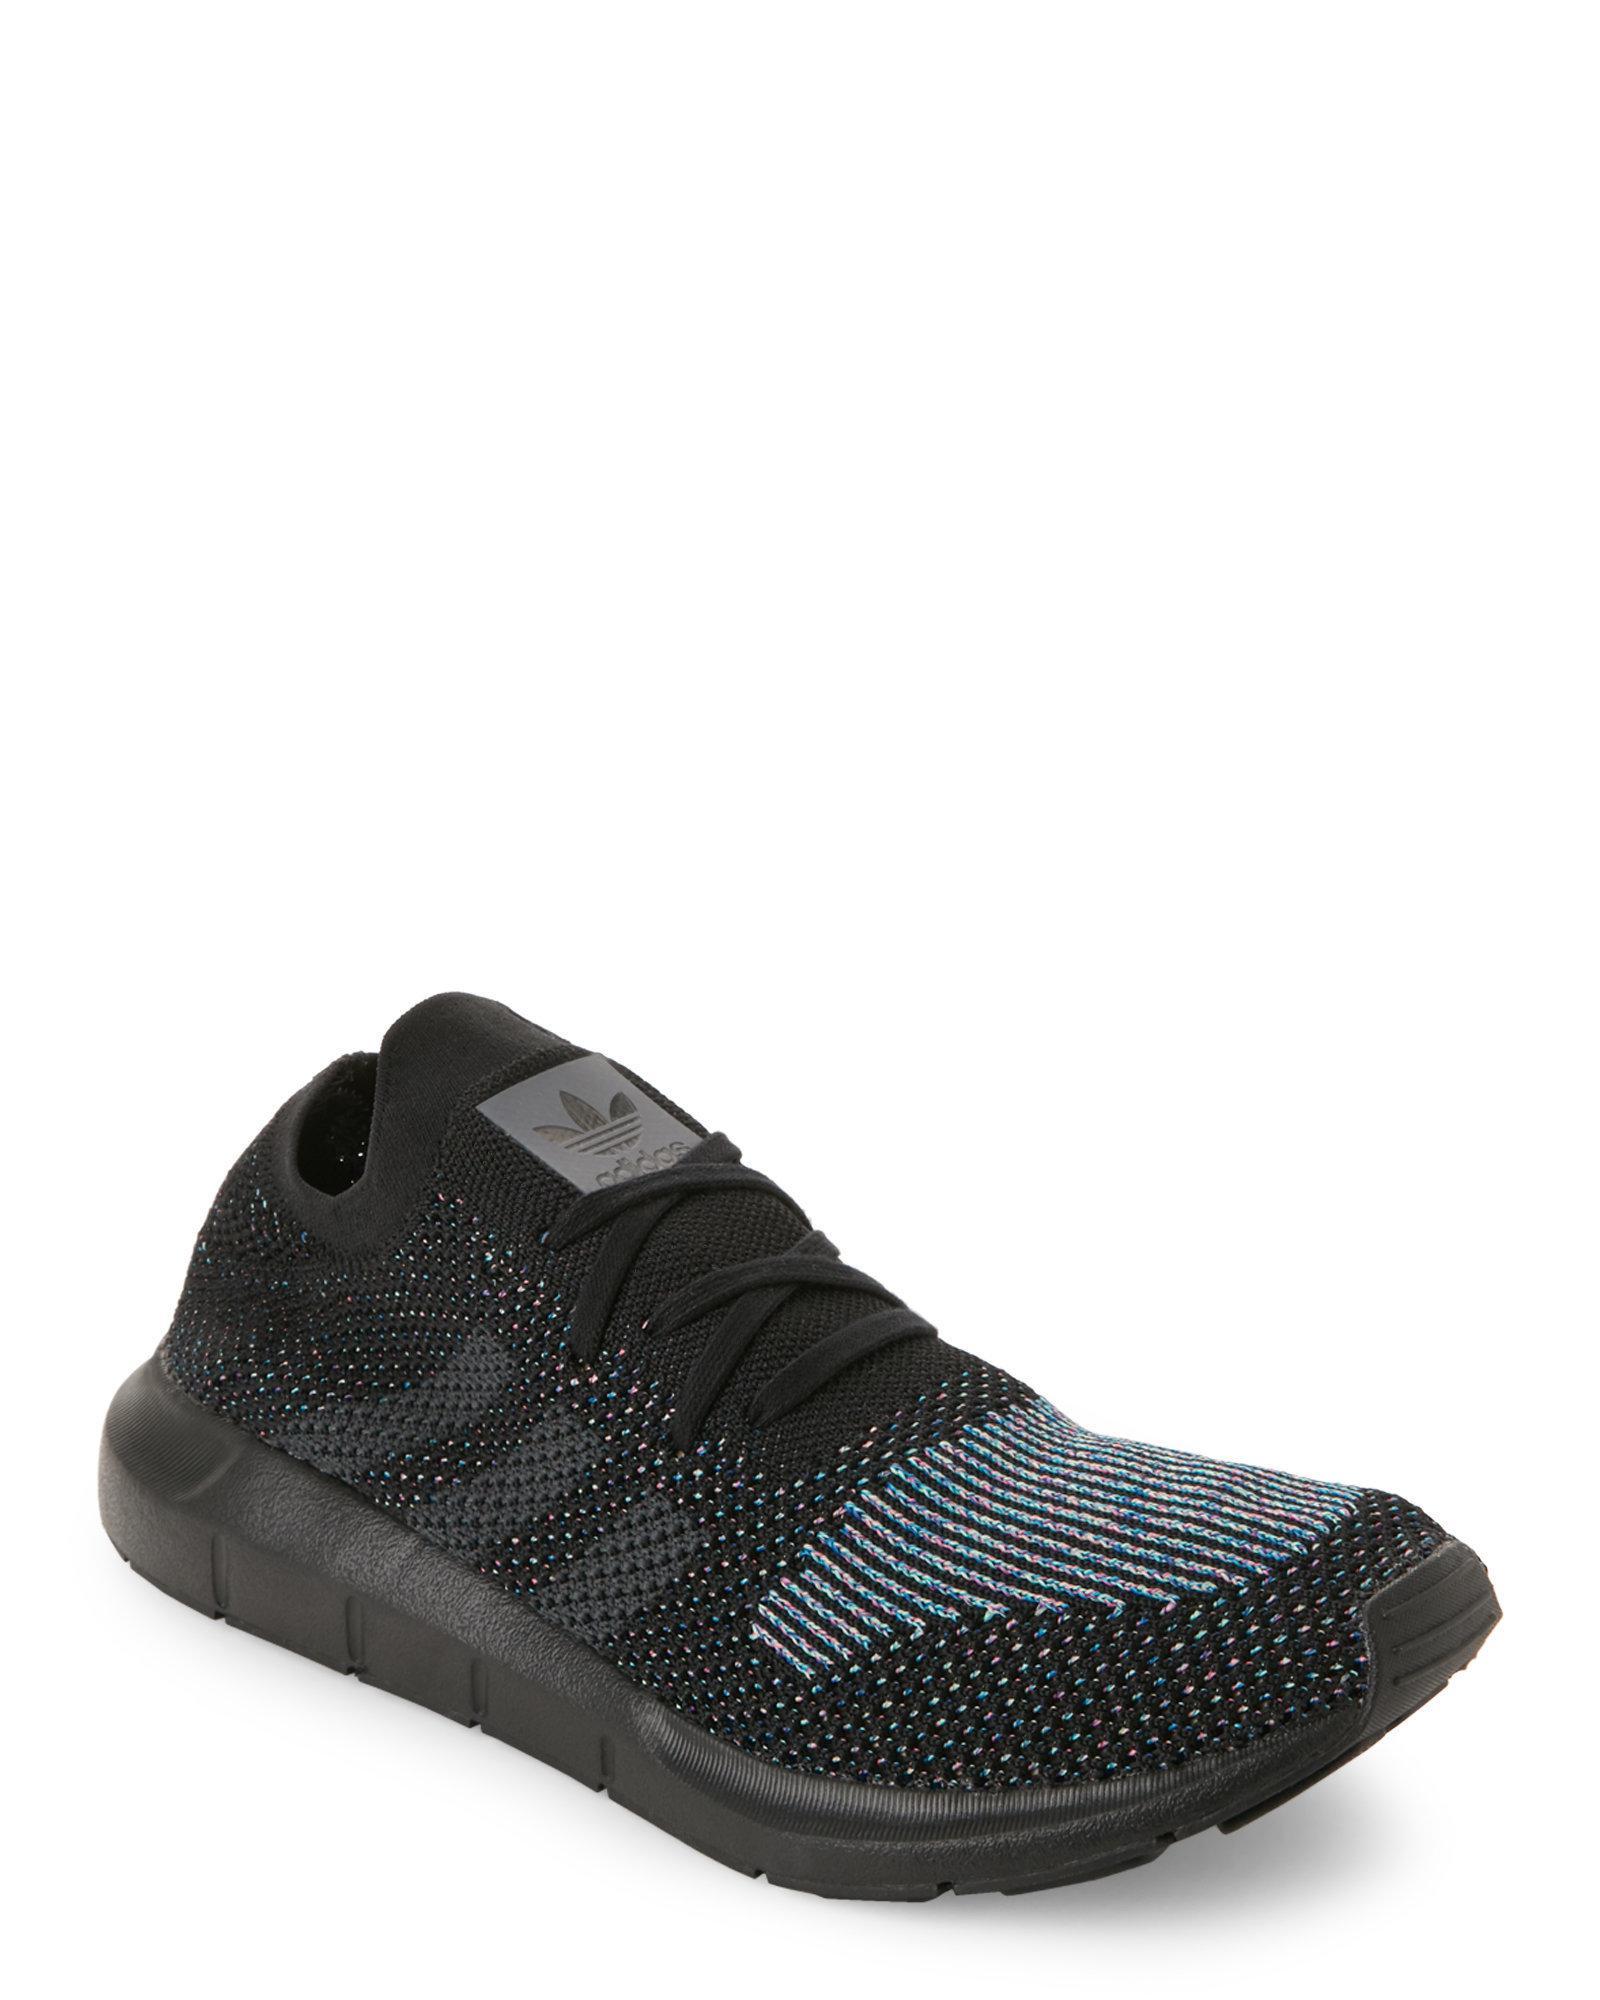 Lyst - Adidas Black   Grey Swift Run Knit Sneakers for Men 8773542f3